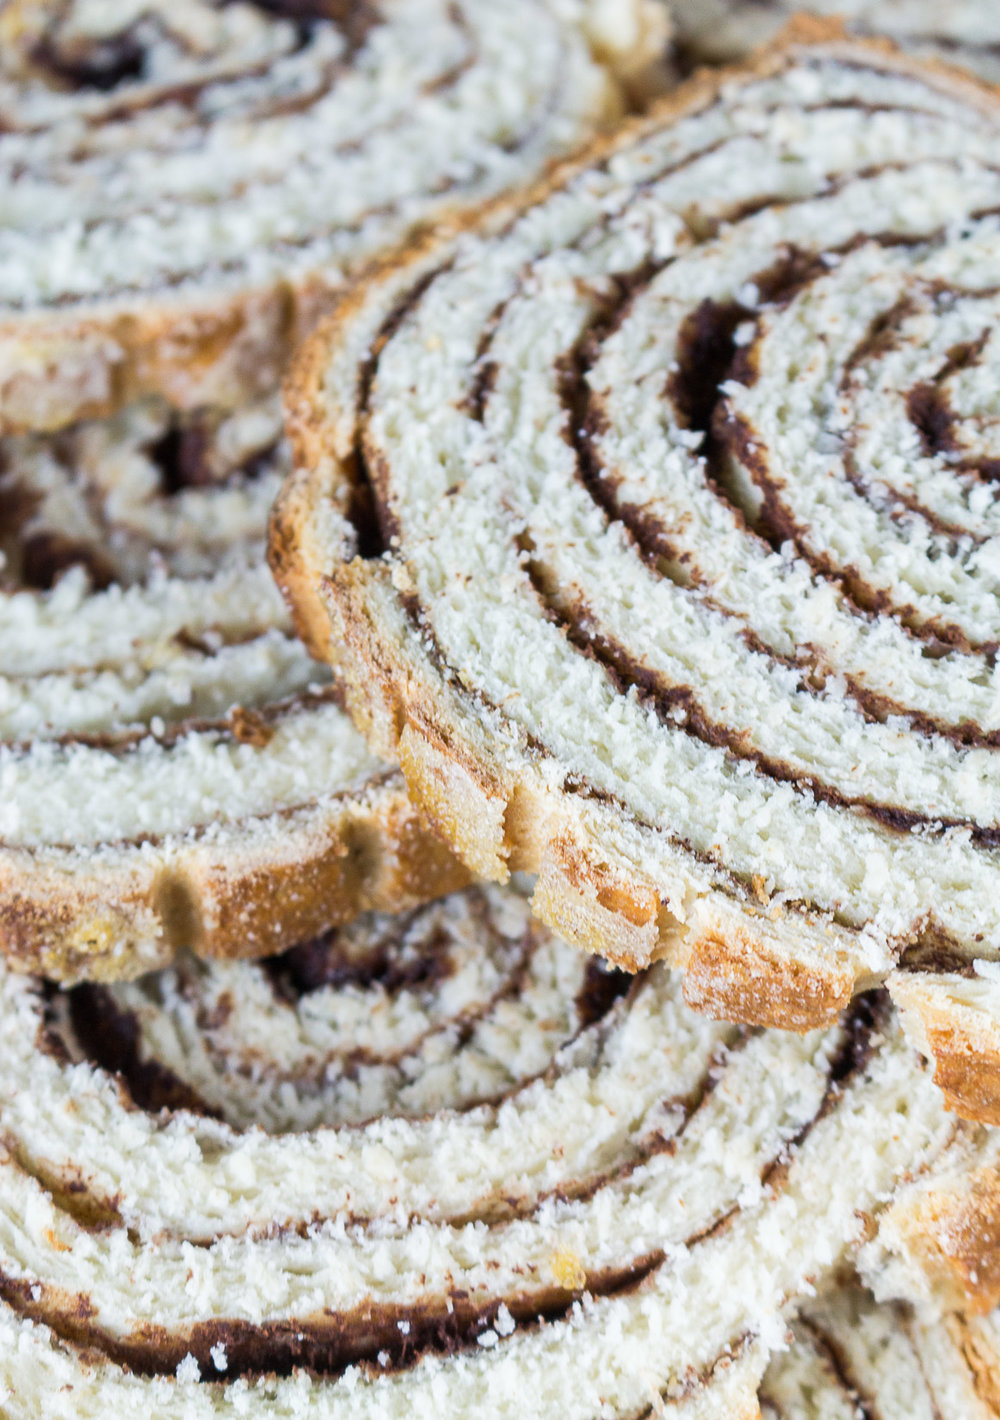 maida-heatter-cinnamon-bread-17.jpg